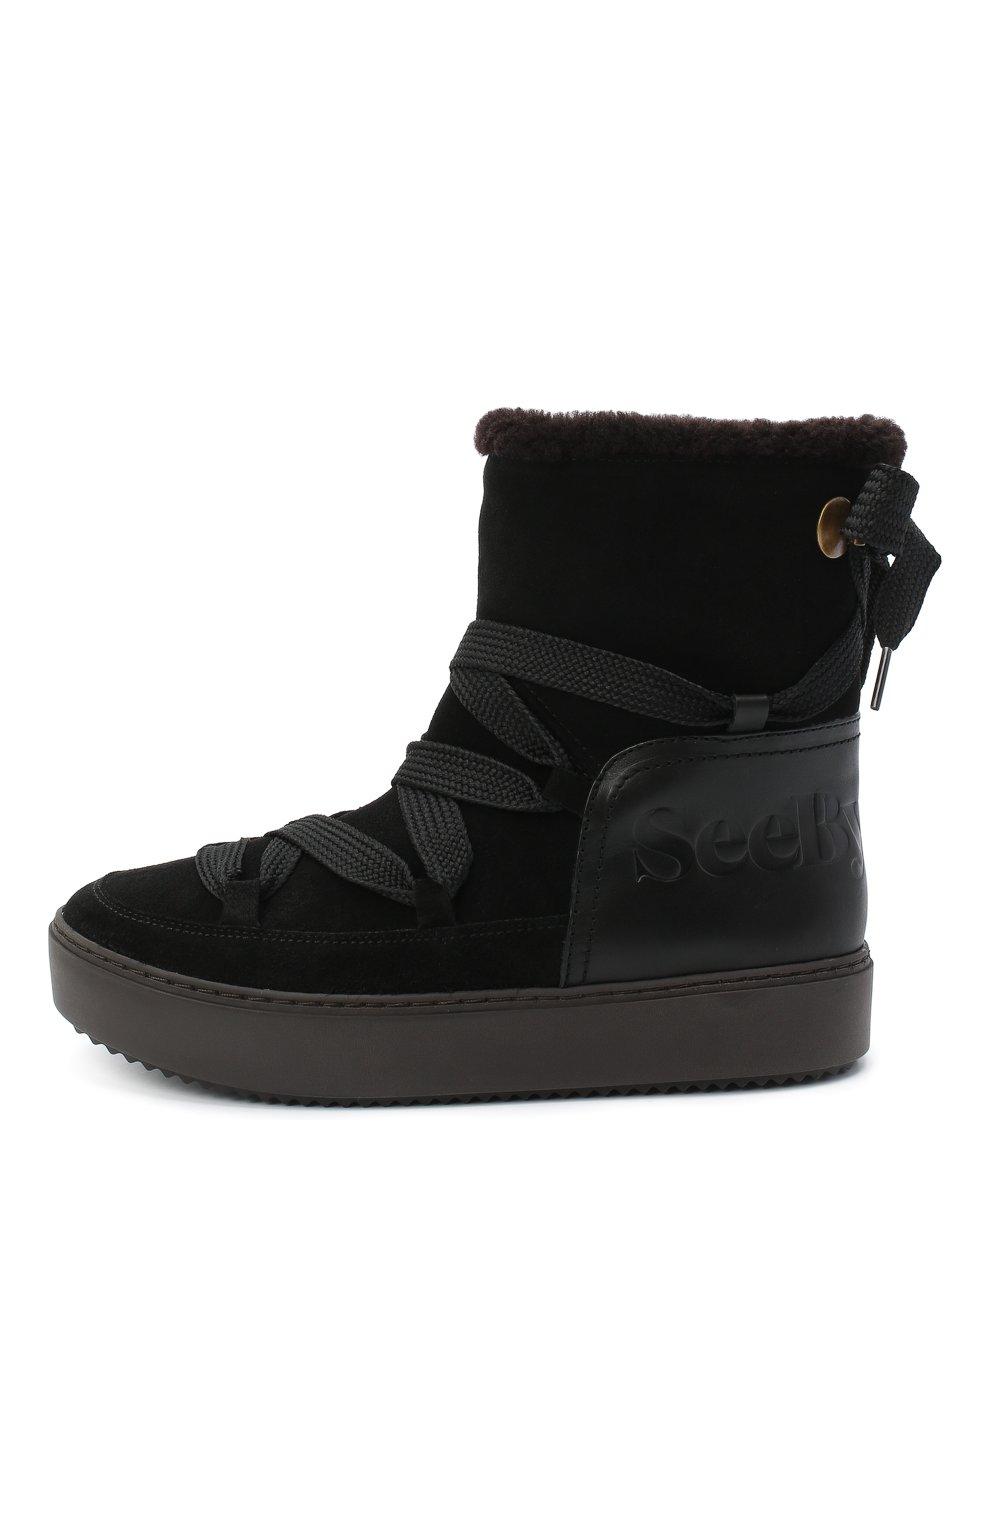 Женские замшевые ботинки SEE BY CHLOÉ черного цвета, арт. SB35151A/12230 | Фото 3